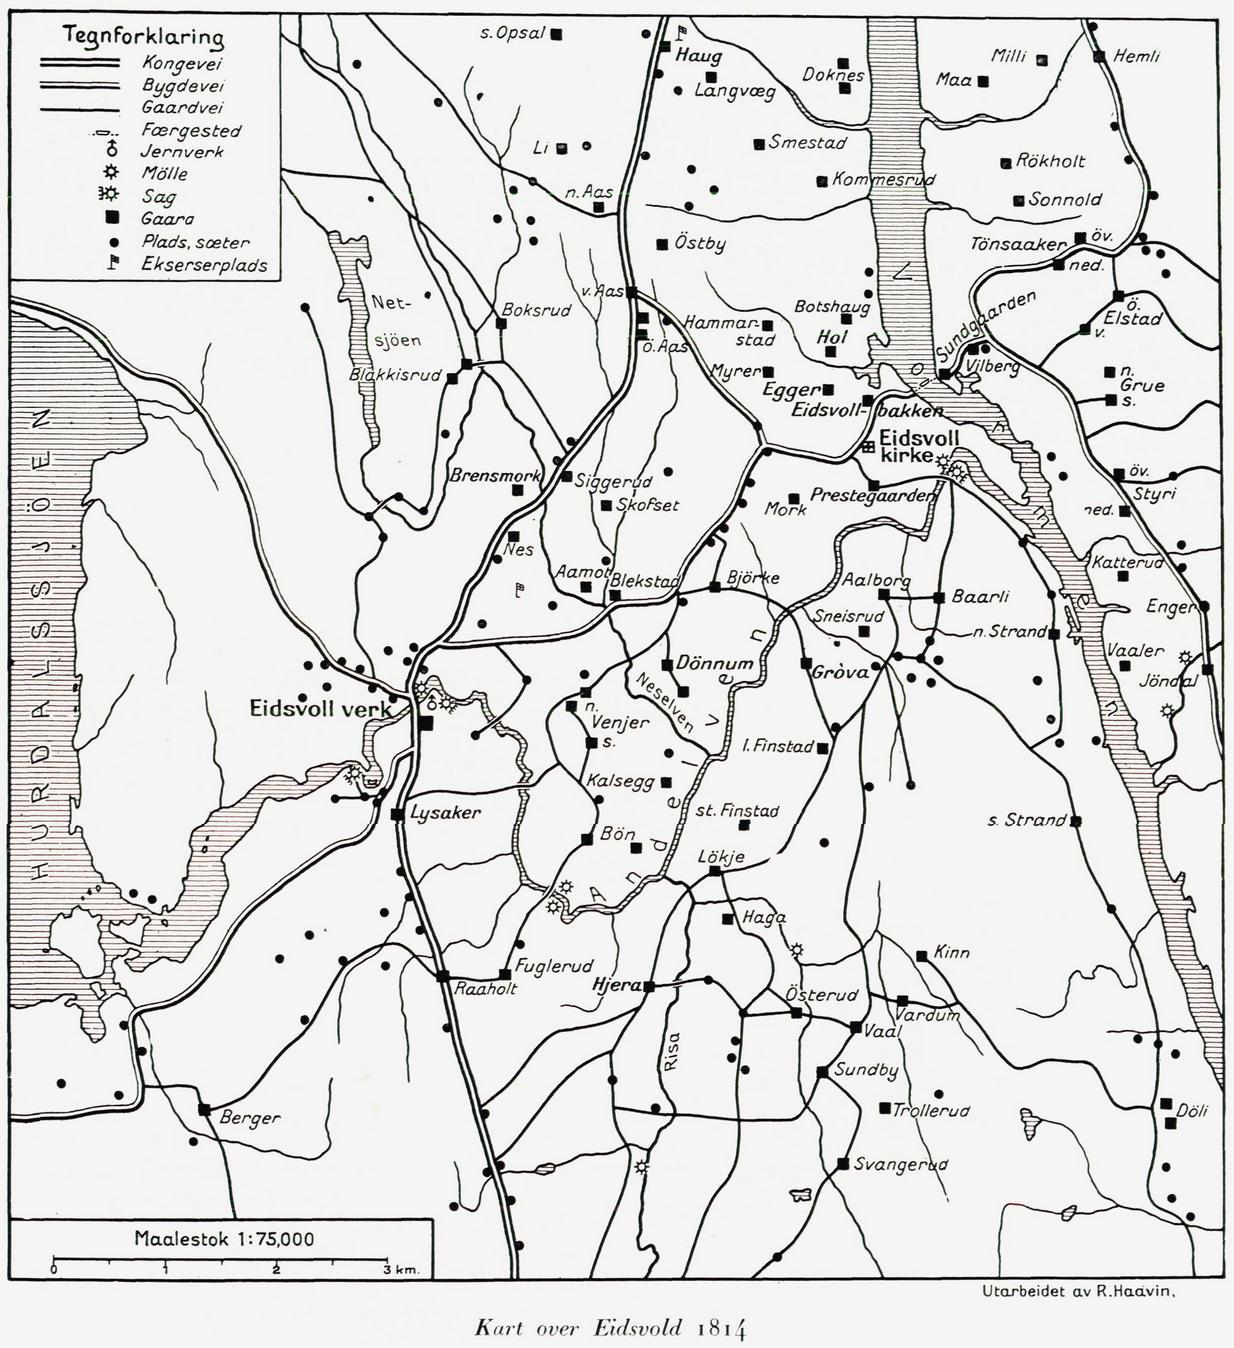 kart over aalborg File:Kart over Eidvold 1814 RHaavin.png   Wikimedia Commons kart over aalborg